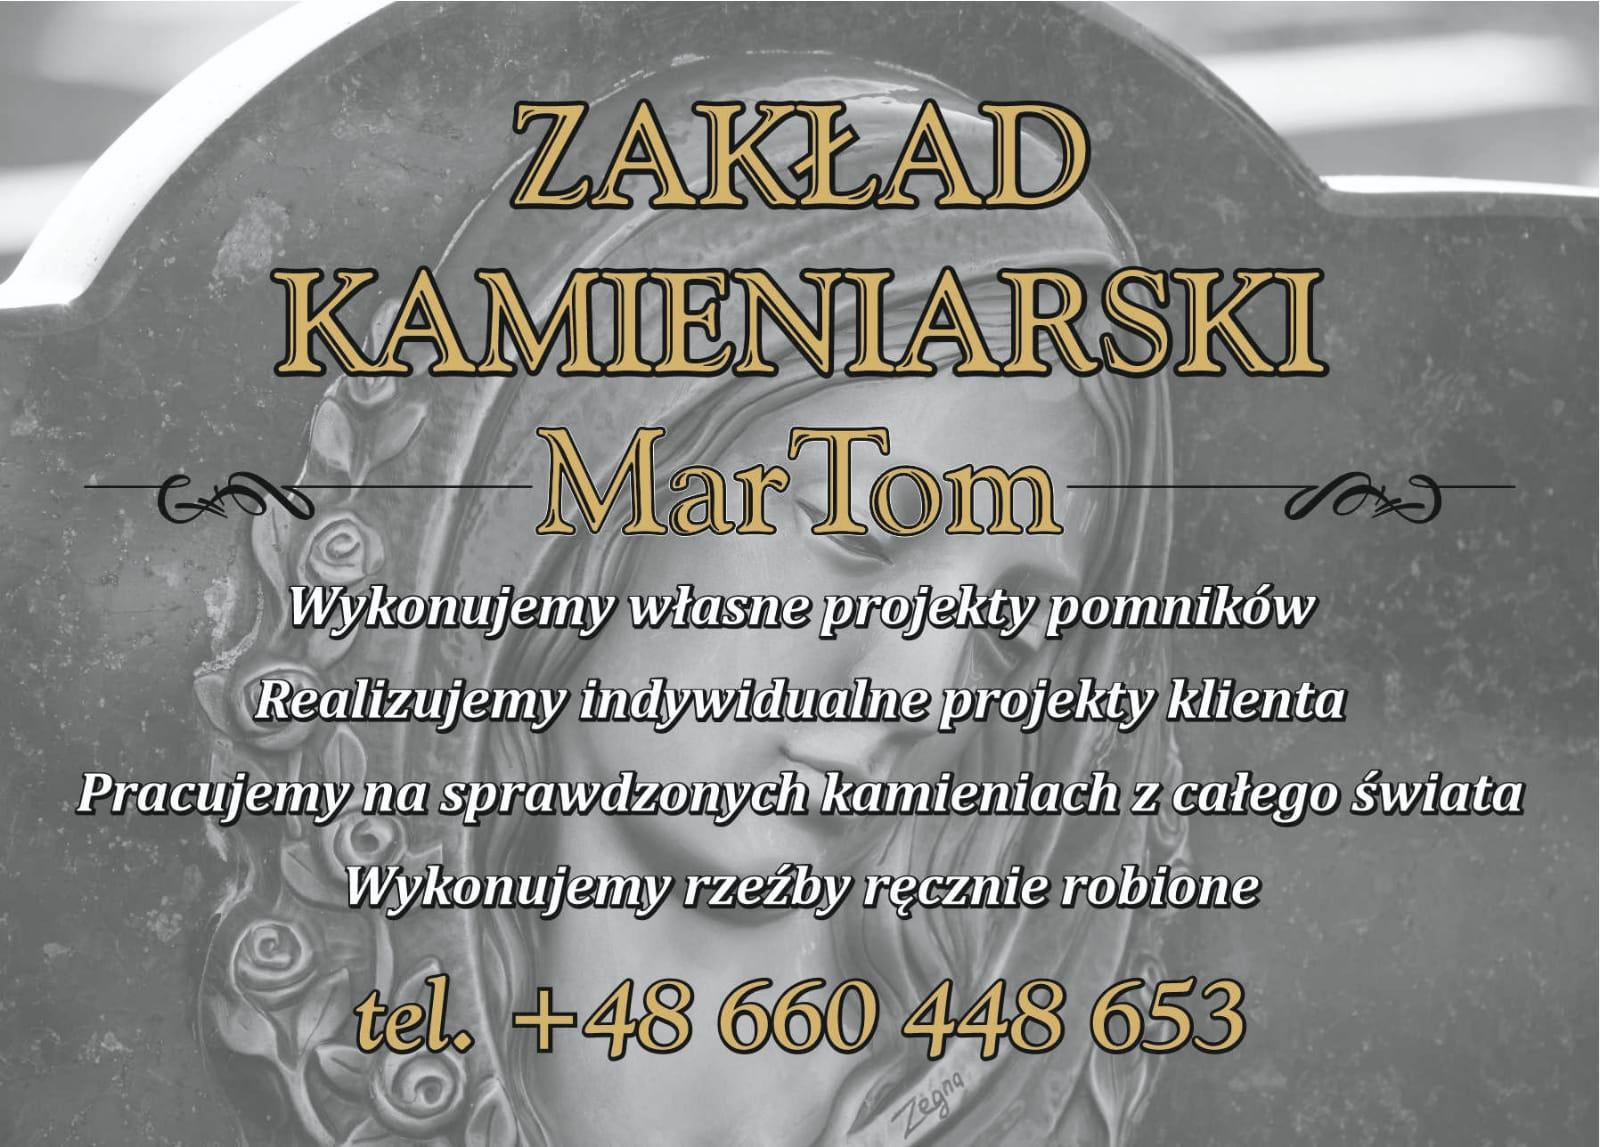 "Nagrobki Pomniki ,, PROMOCJA"" Zadzwoń i zapytaj"